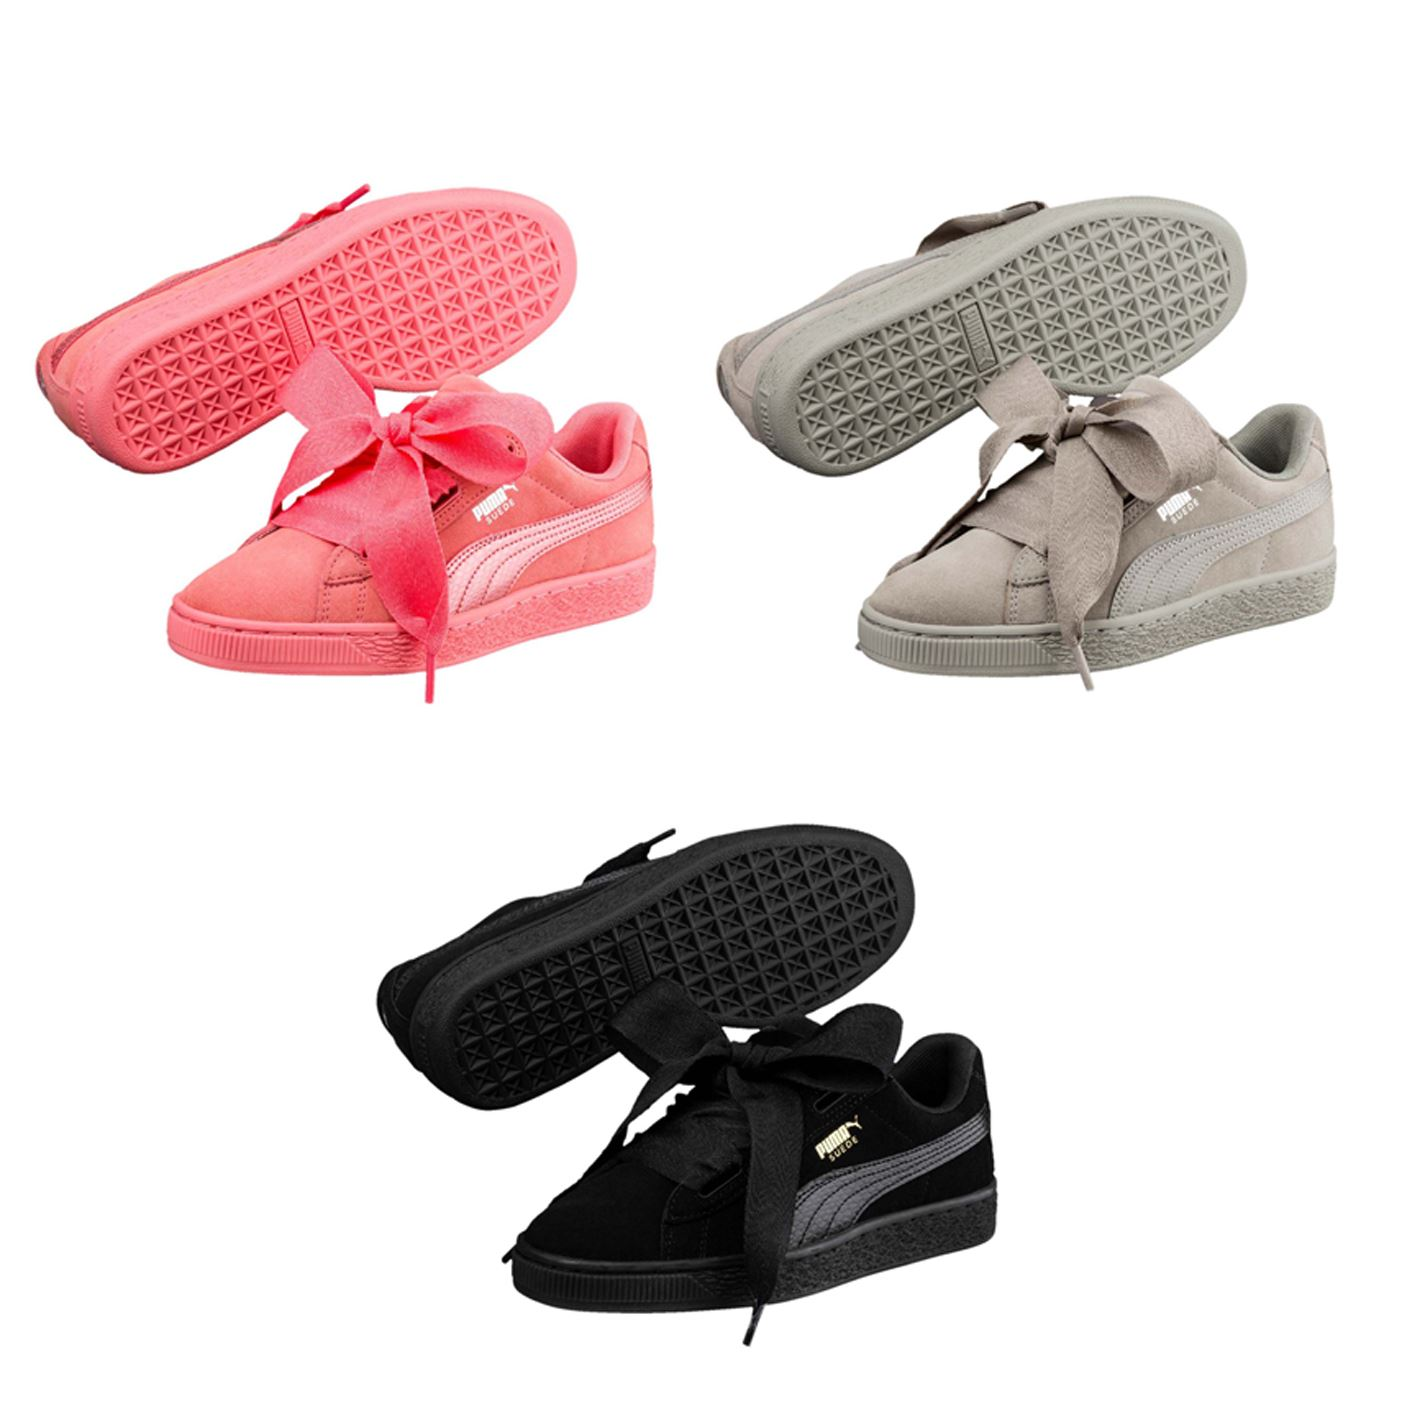 ... Puma Suede Heart Sneakers Girls Shoes Footwear ... e9c509cca